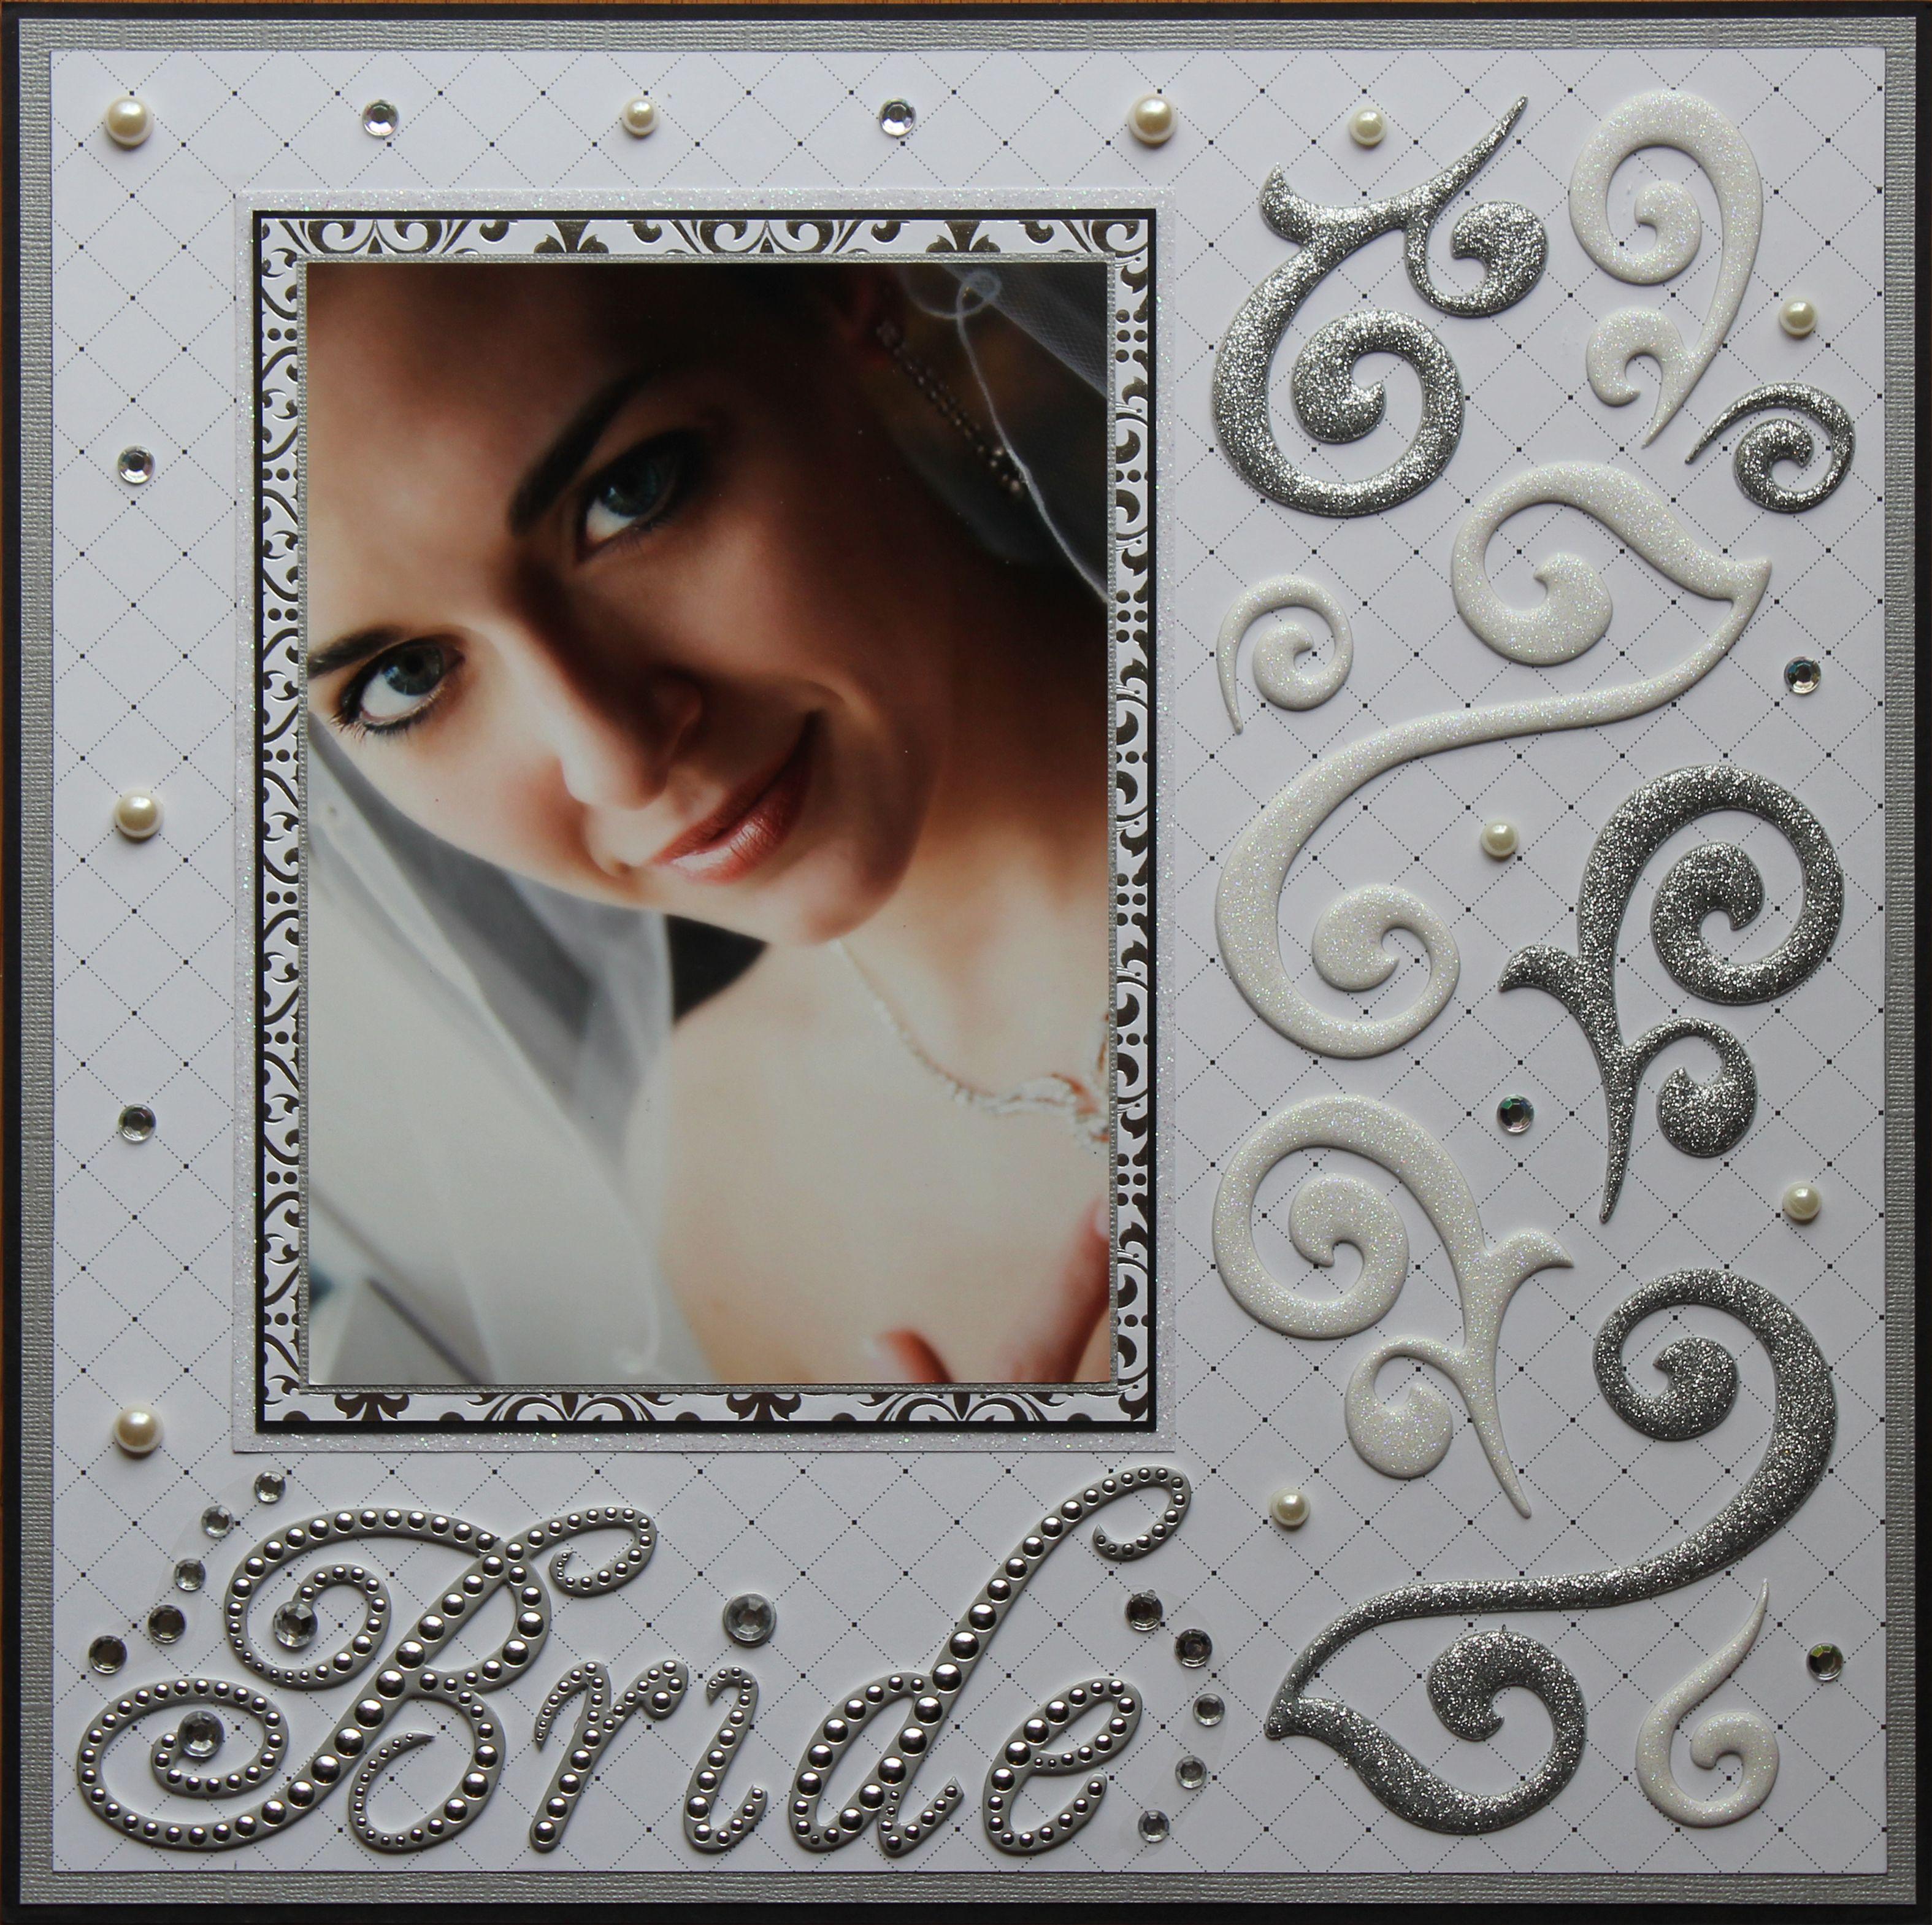 Scrapbook ideas without photos - Bride An Elegantly Stunning Layout Wedding Scrapbooking